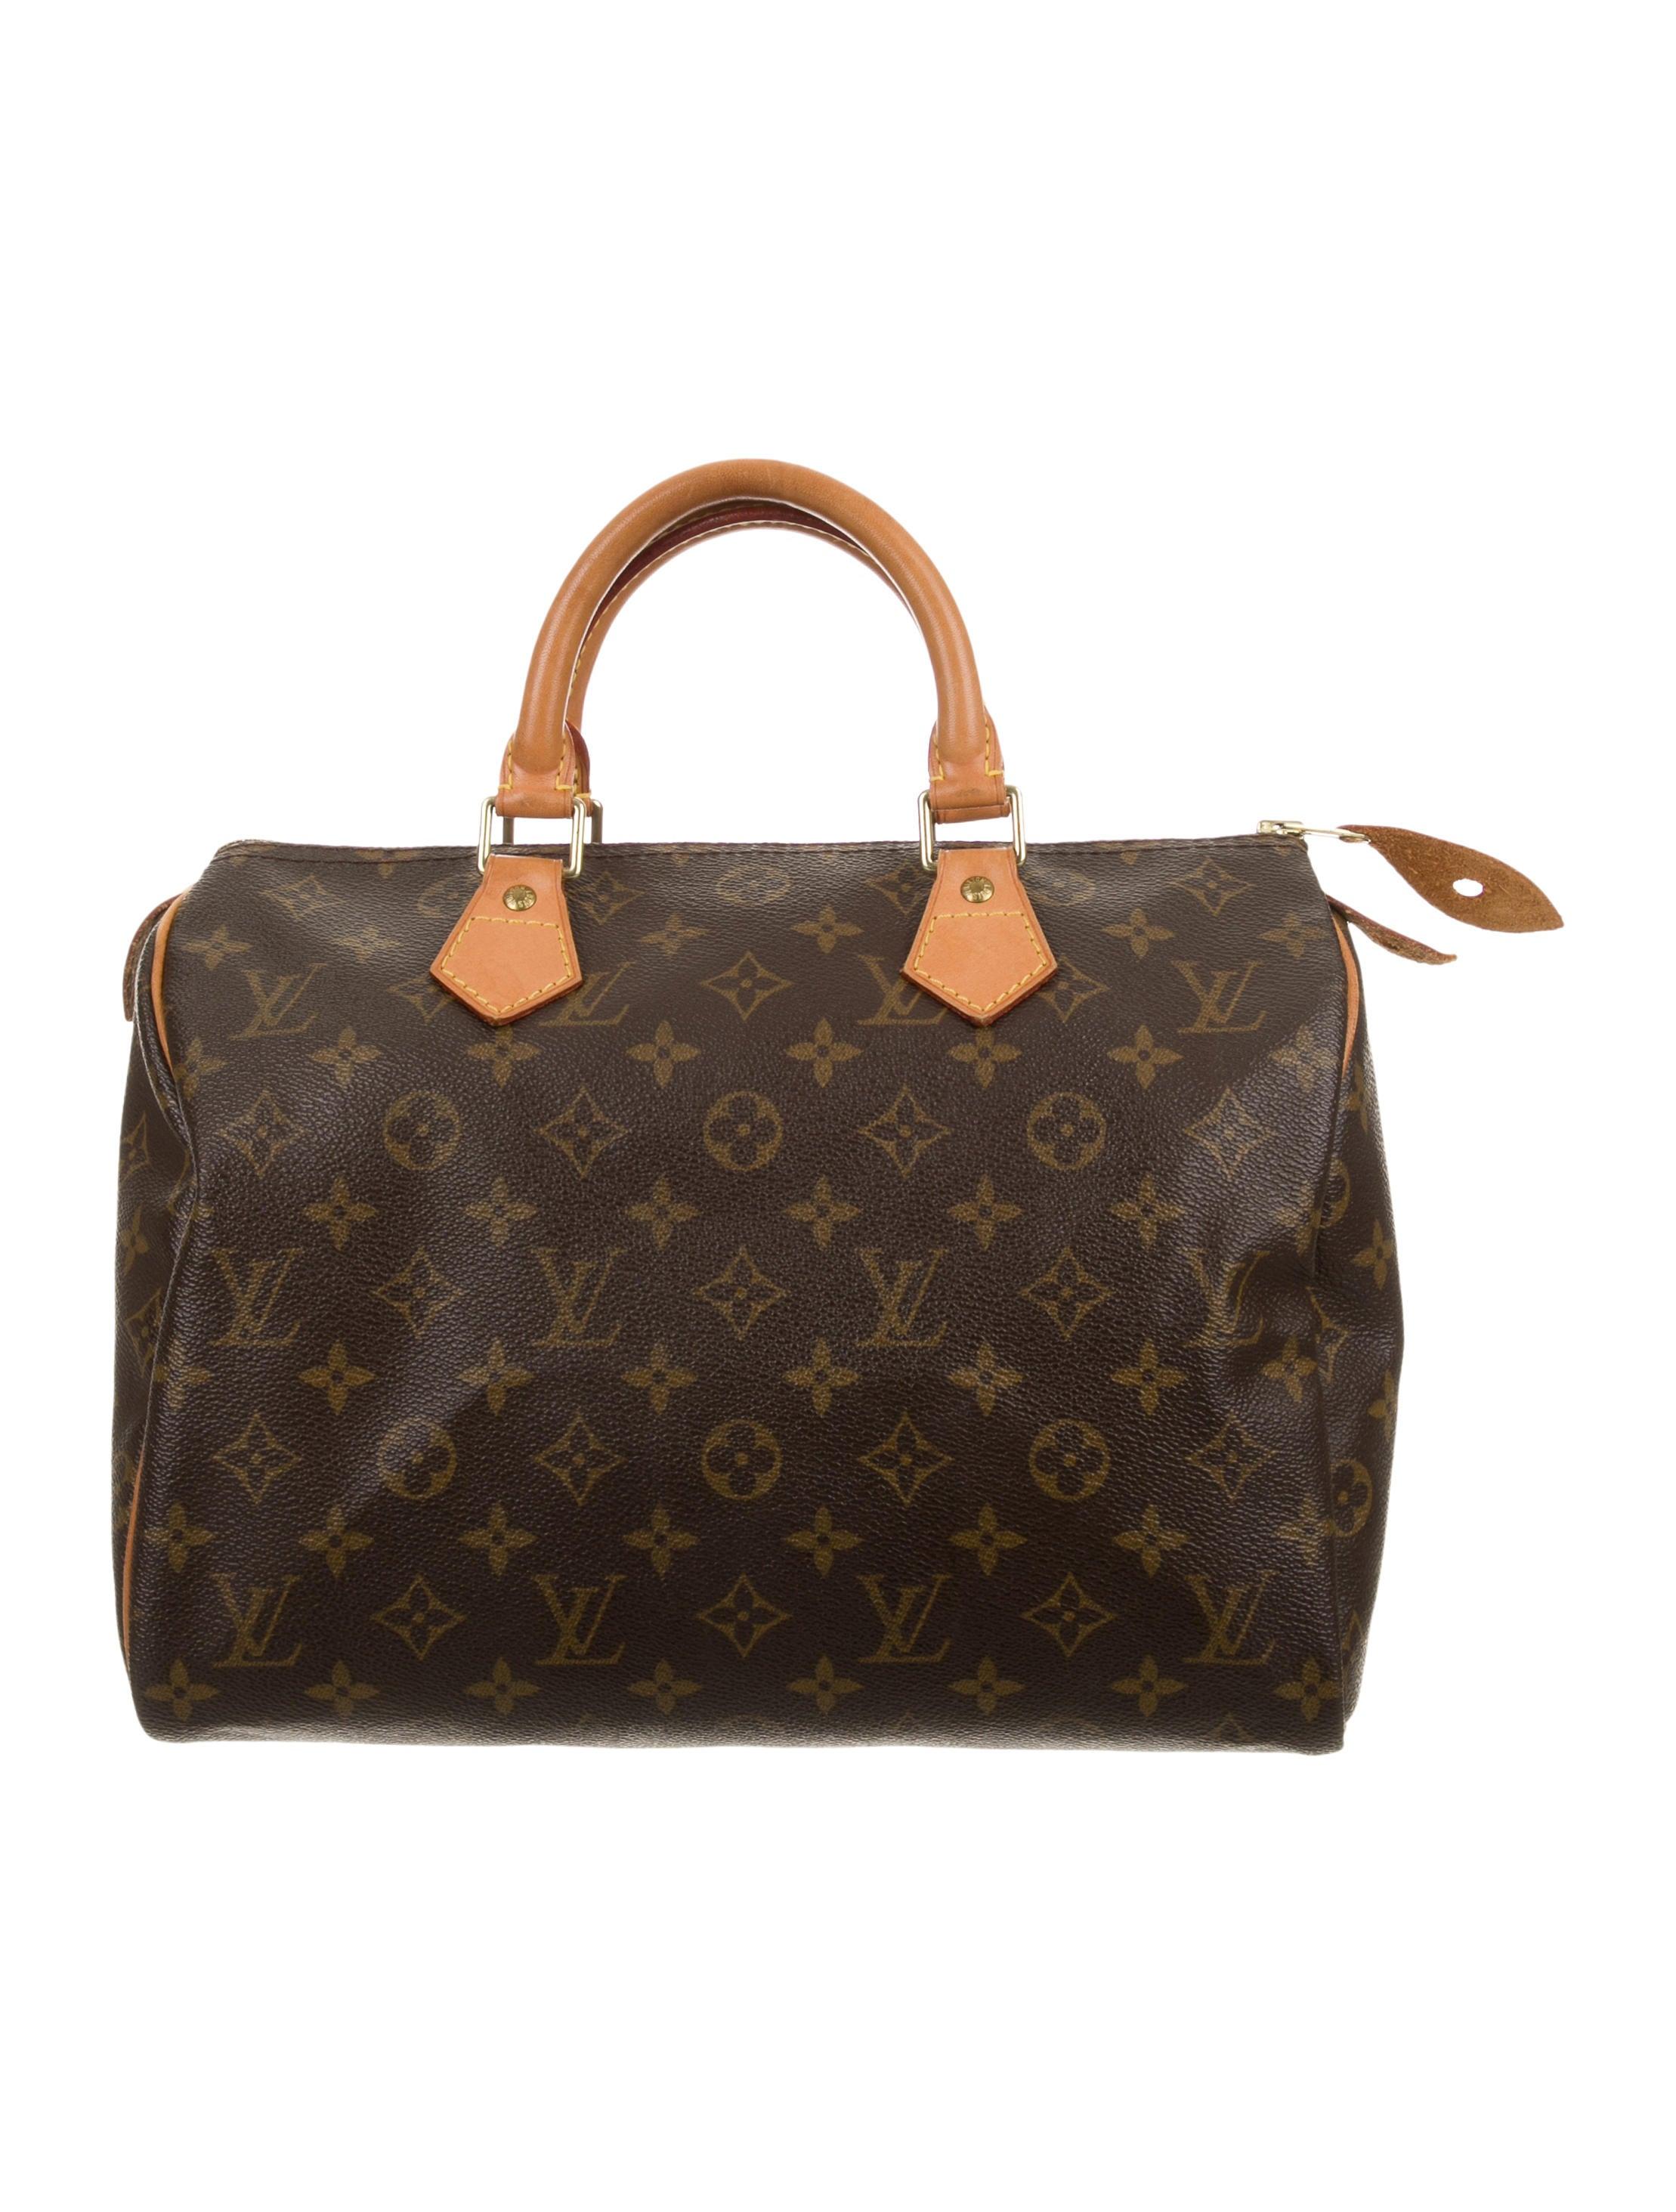 Handbags | The RealReal